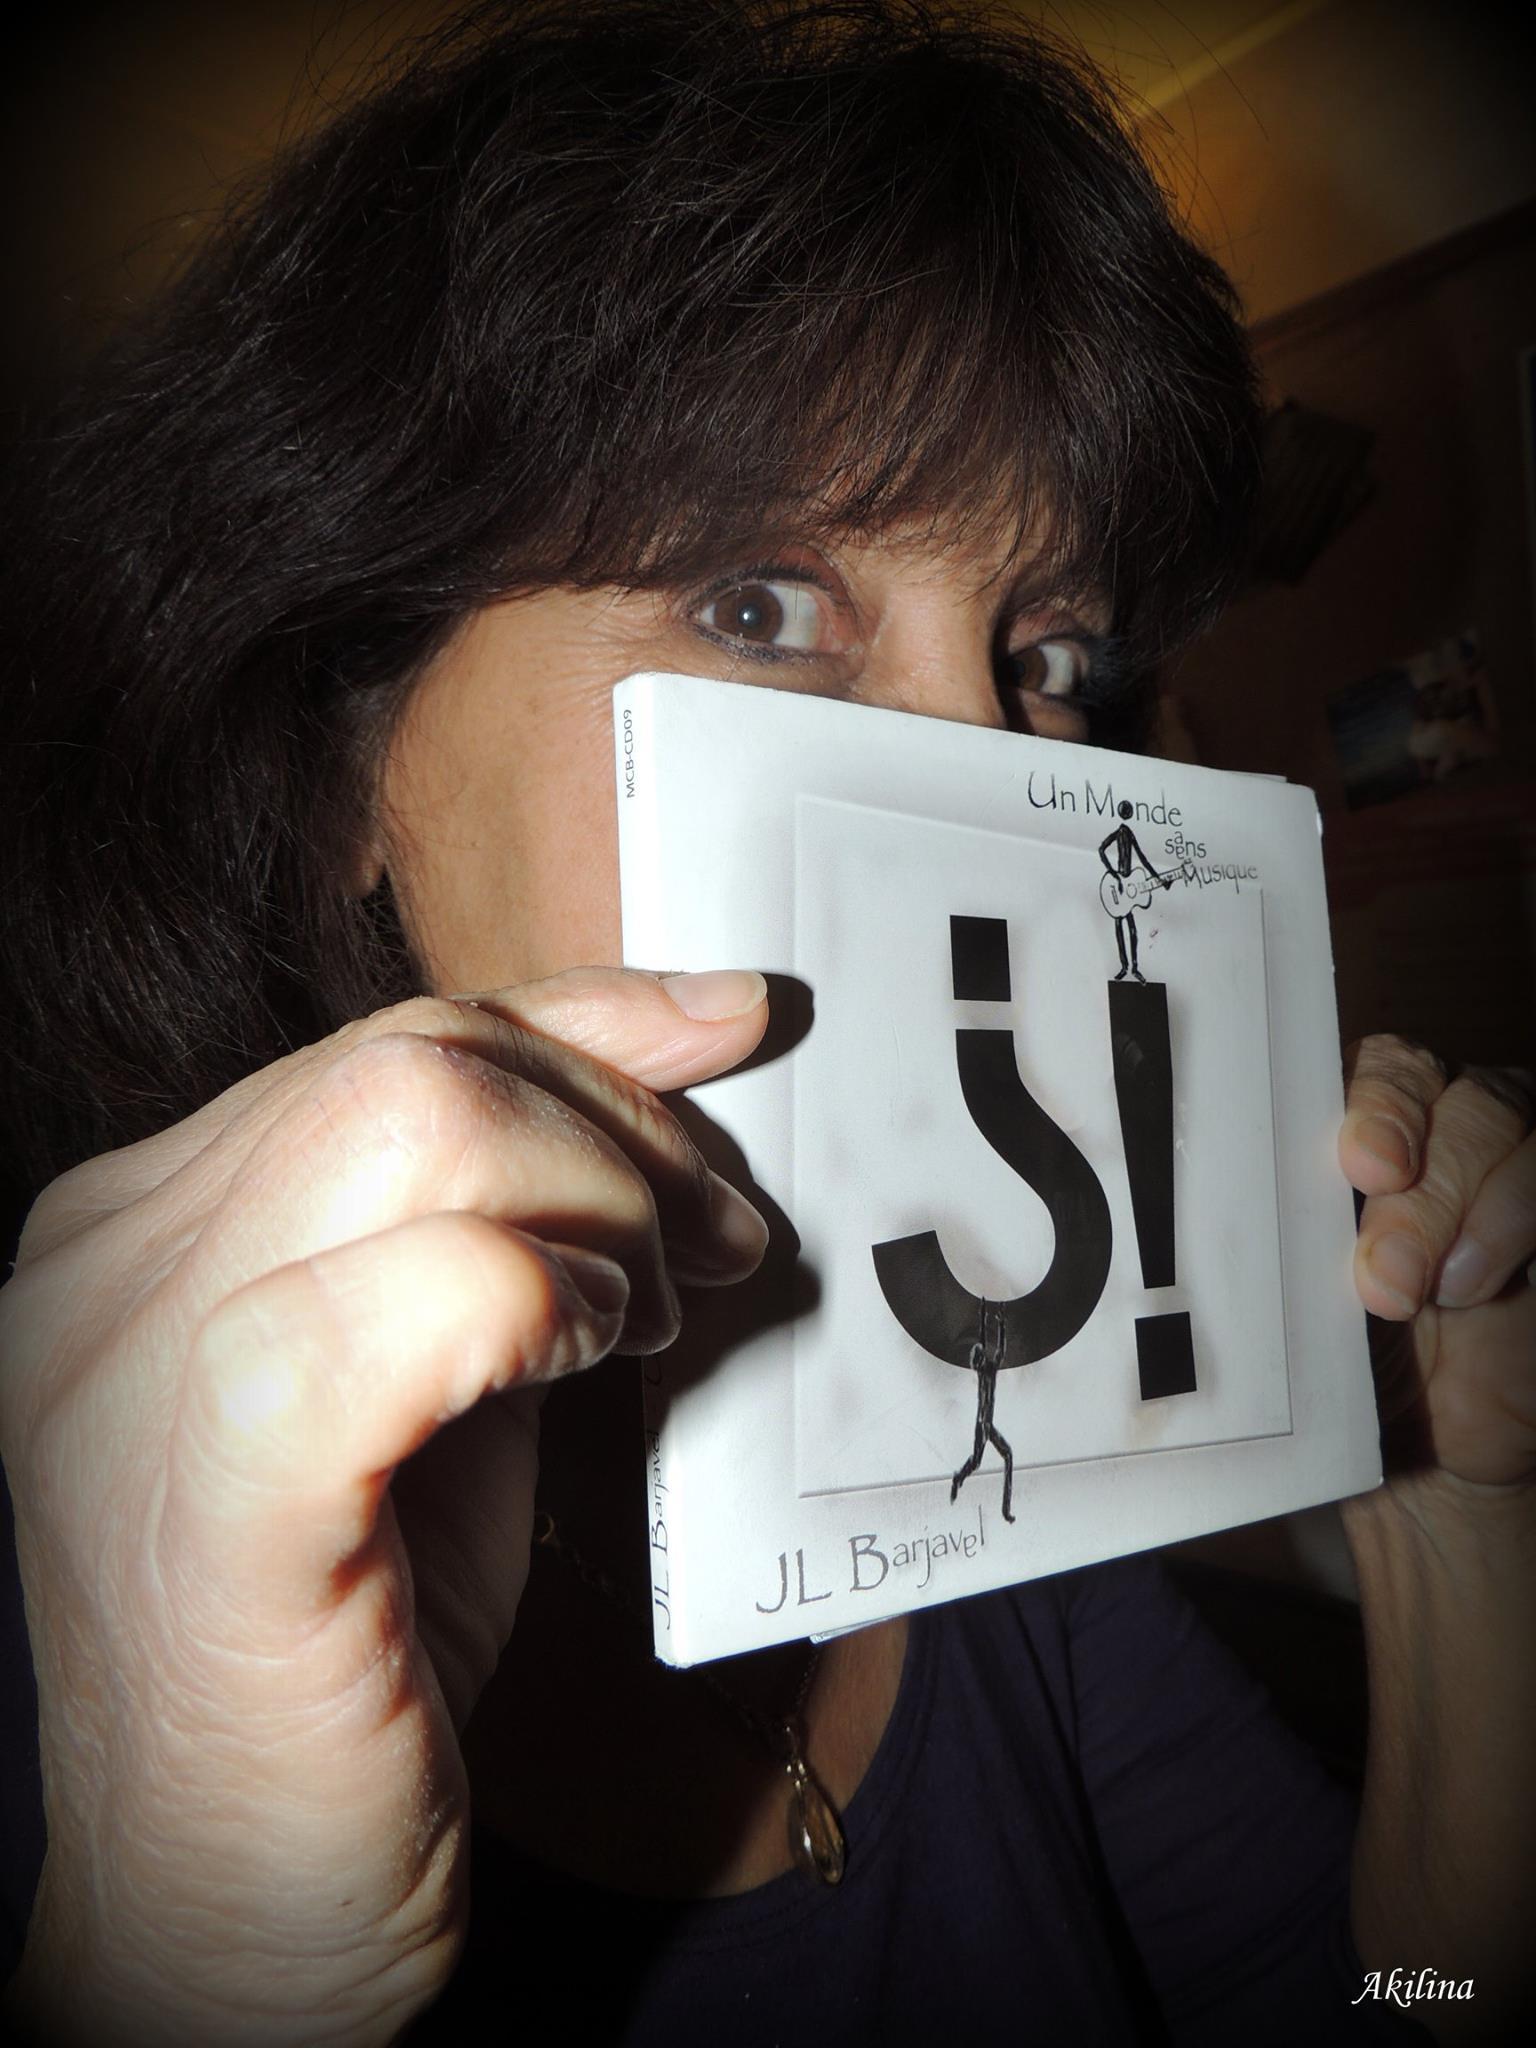 JL Album by Sylvia 108.jpg